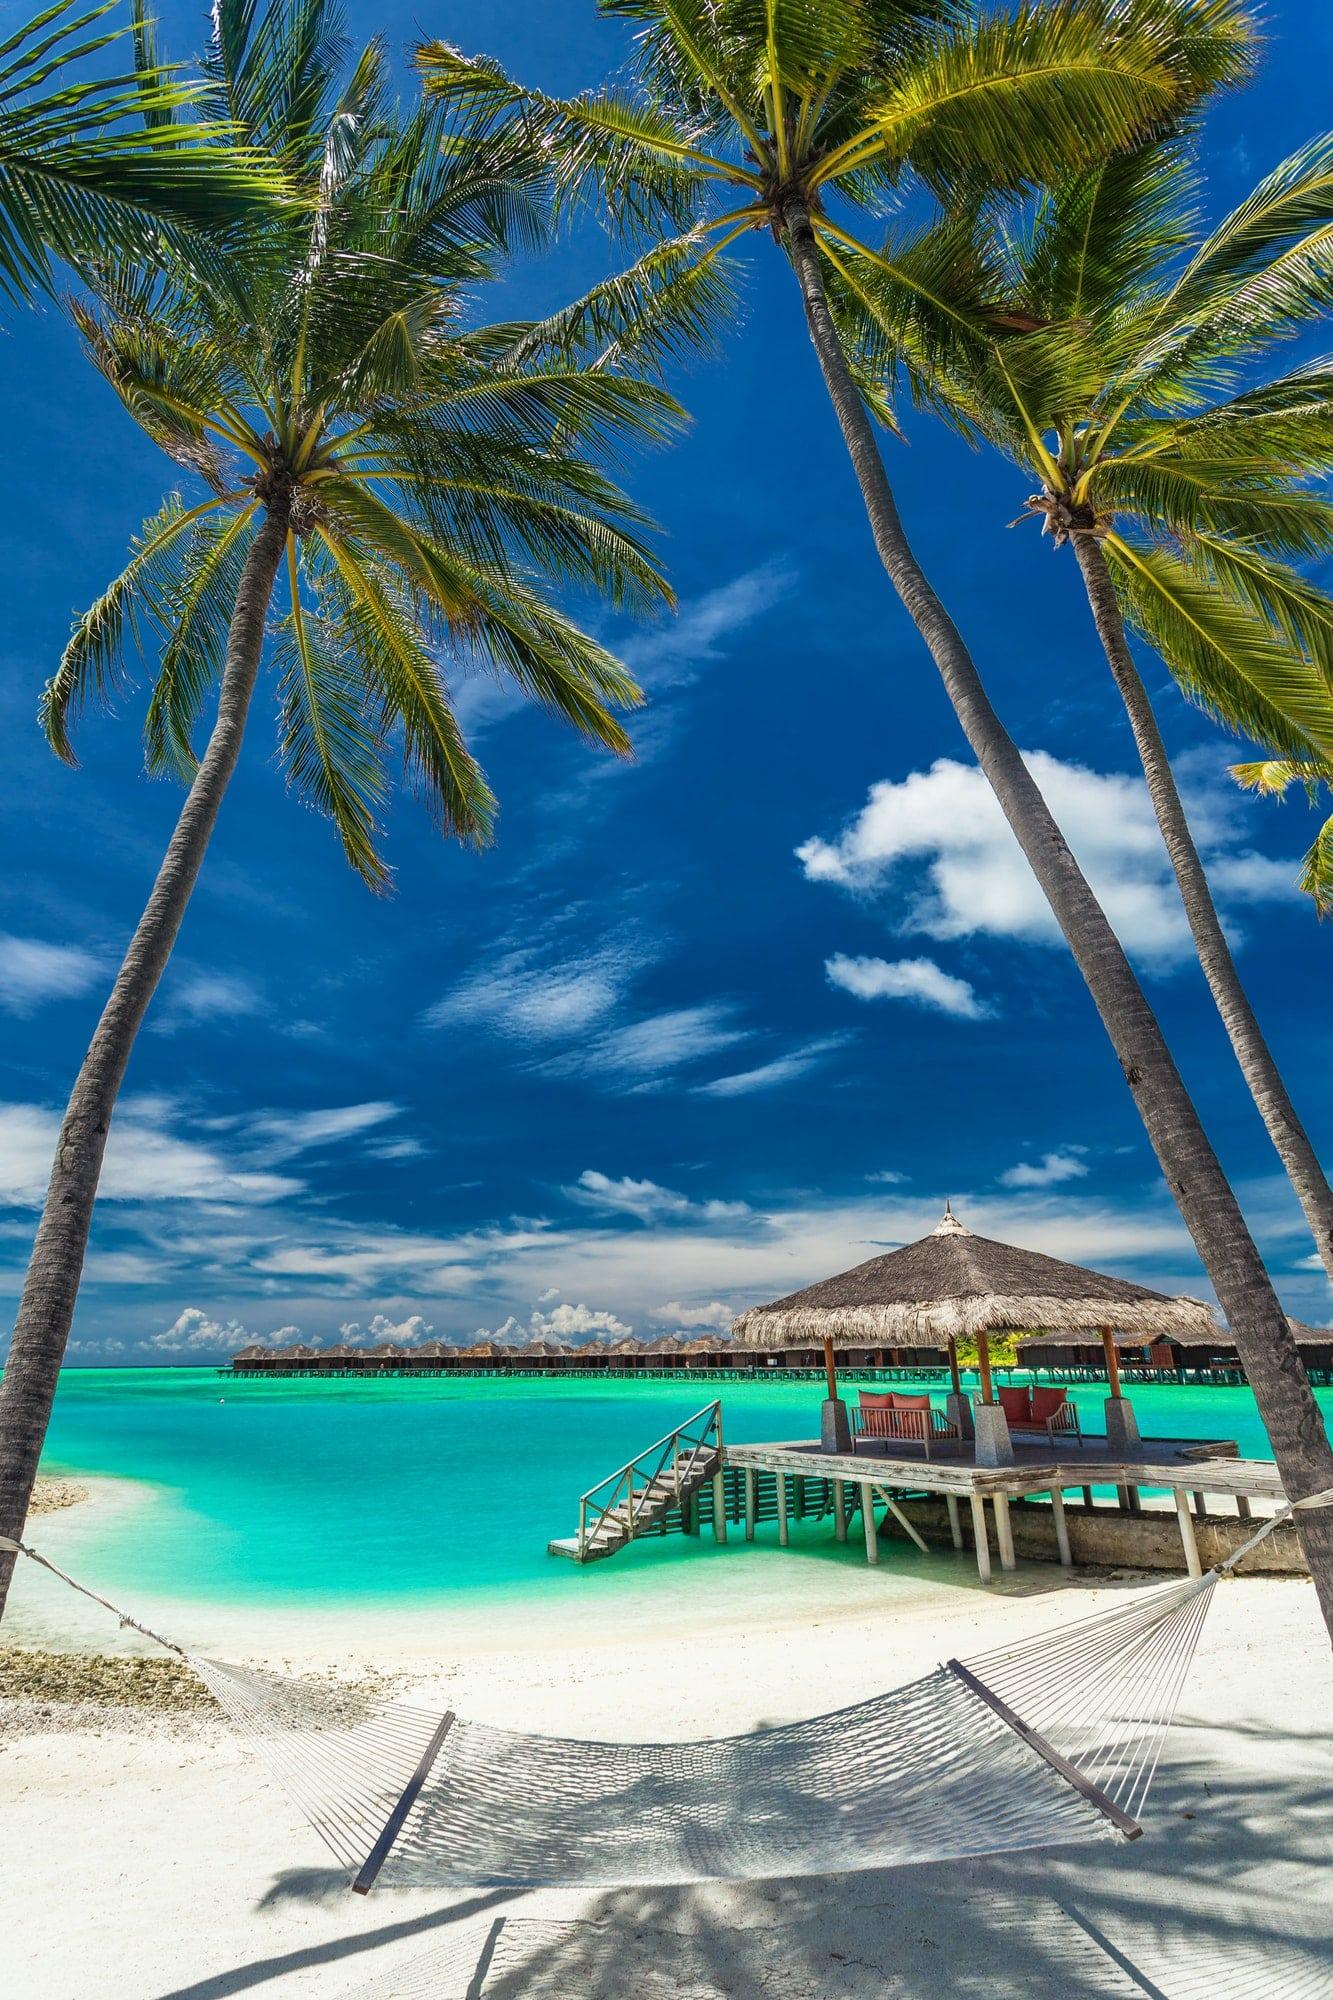 Hammock between palm trees on a tropical beach, Maldives